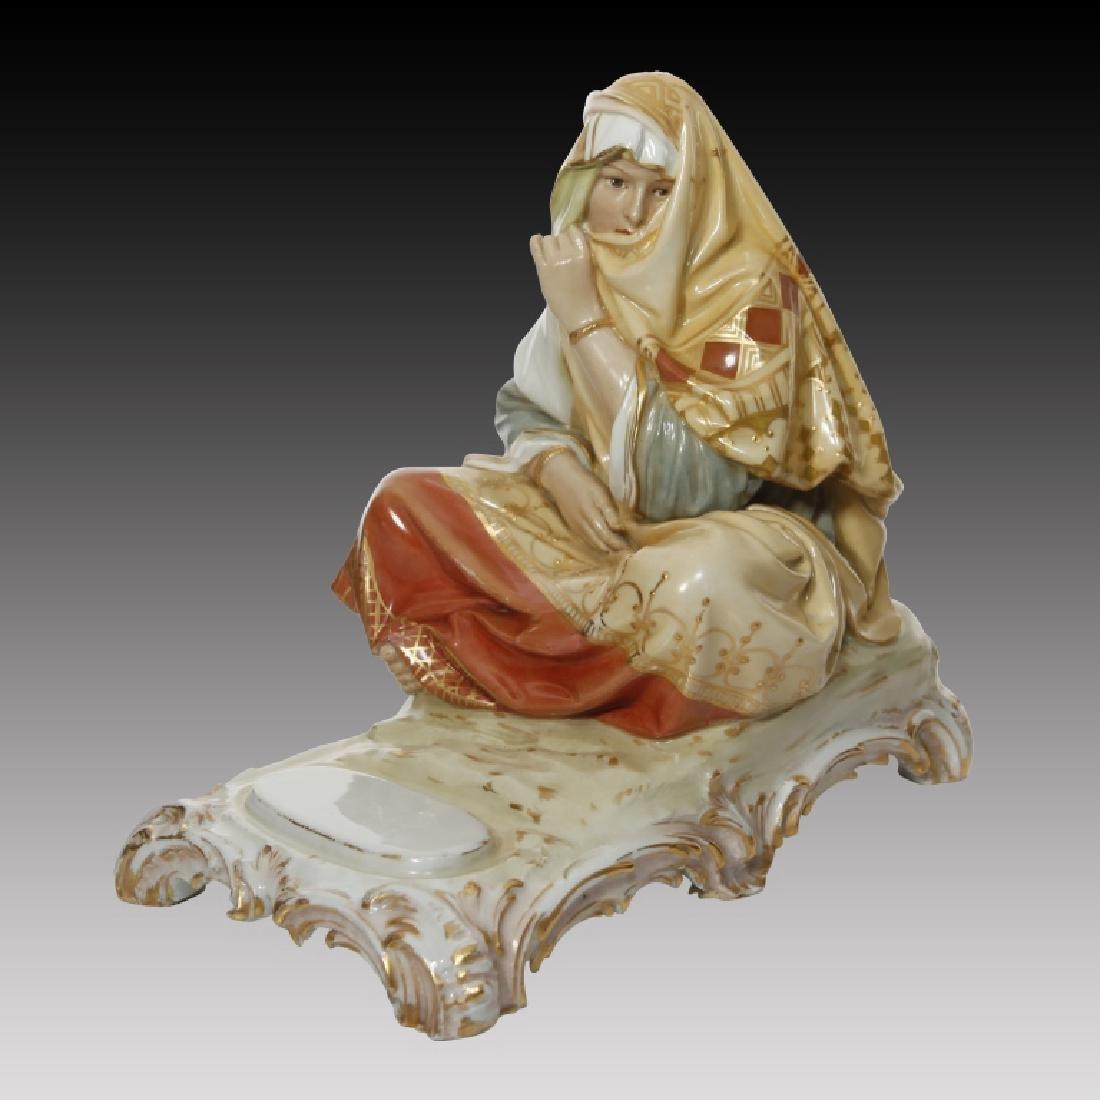 KPM Polychrome Figure of Woman in Arab Costume